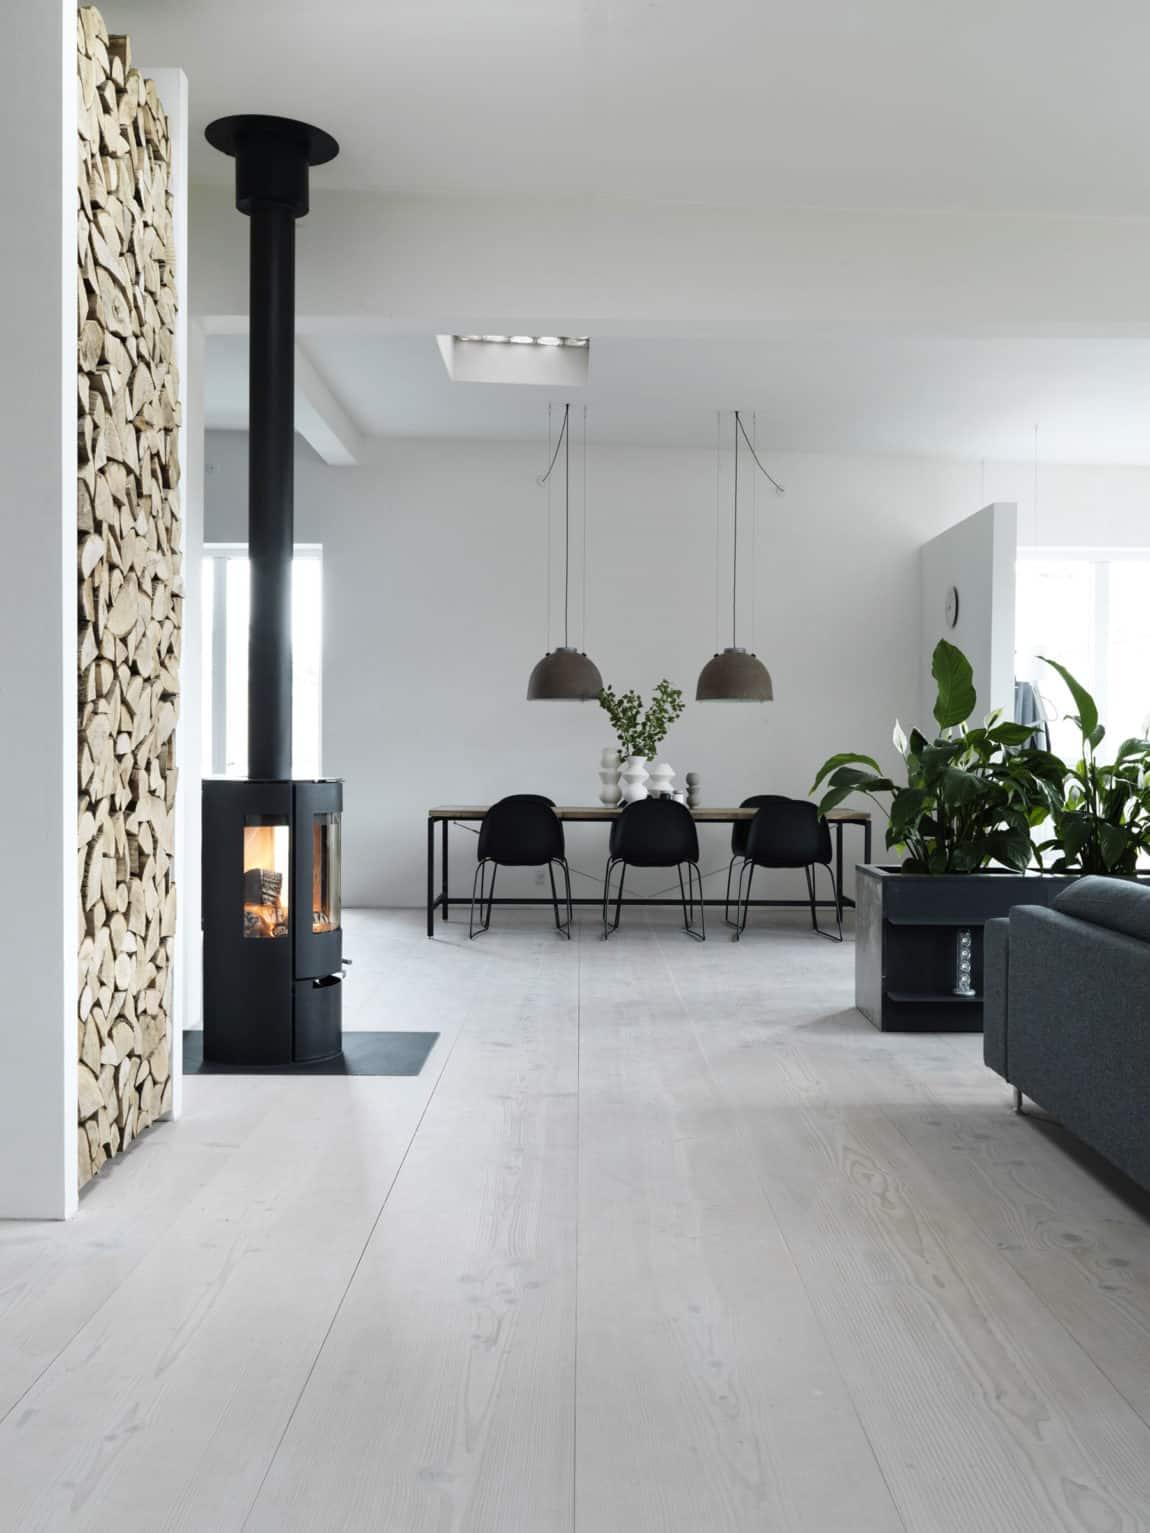 The Home of Morten Bo Jensen by Vipp (10)